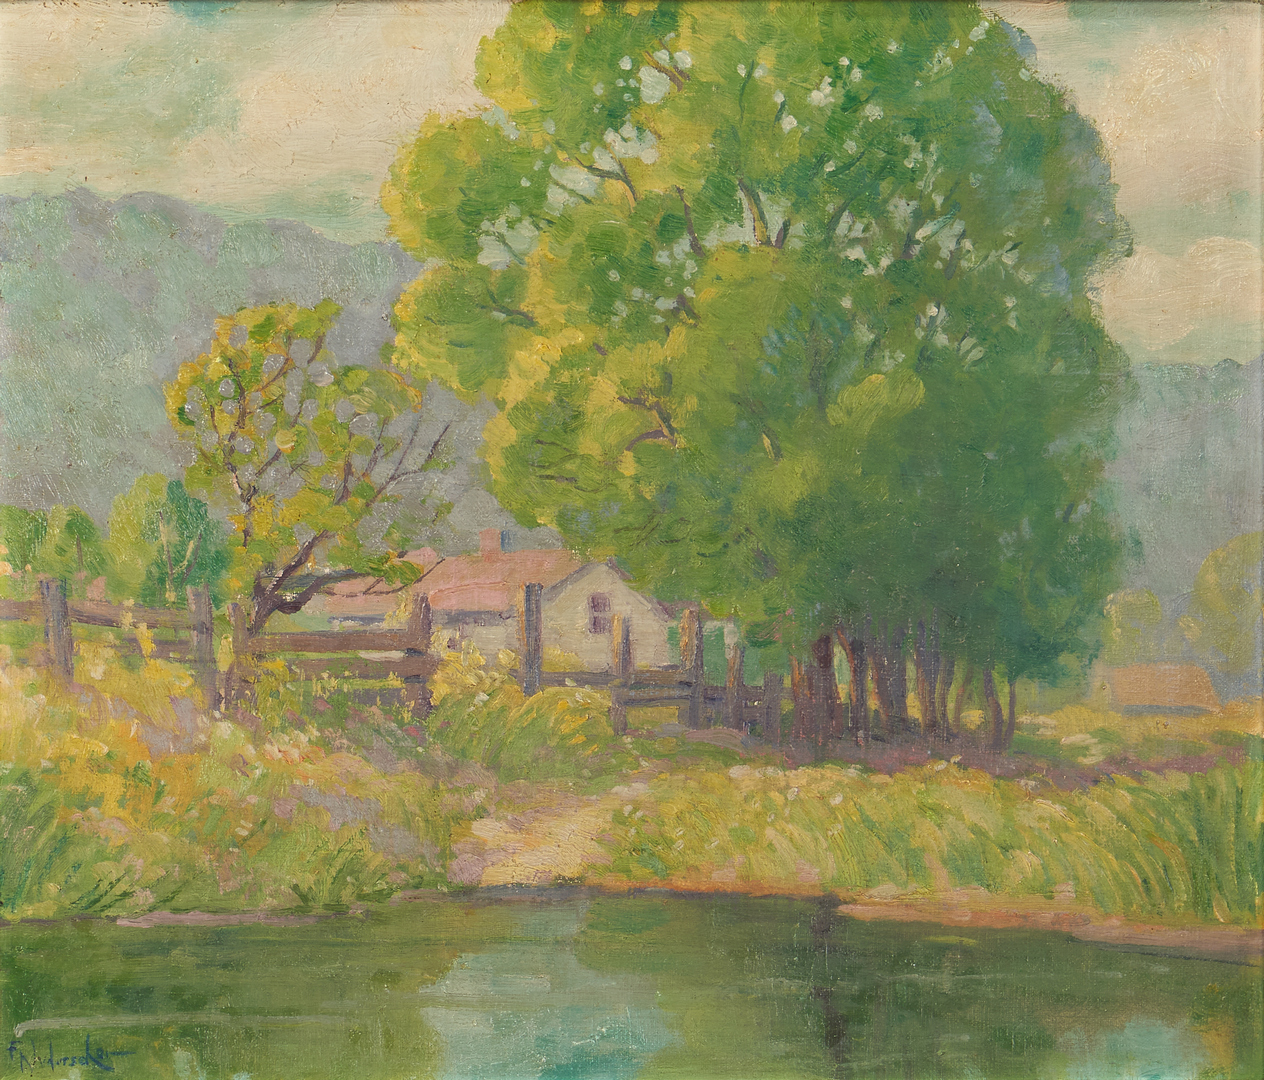 Lot 999: Frank B. Nuderscher O/B, Exhibited Ozark Landscape